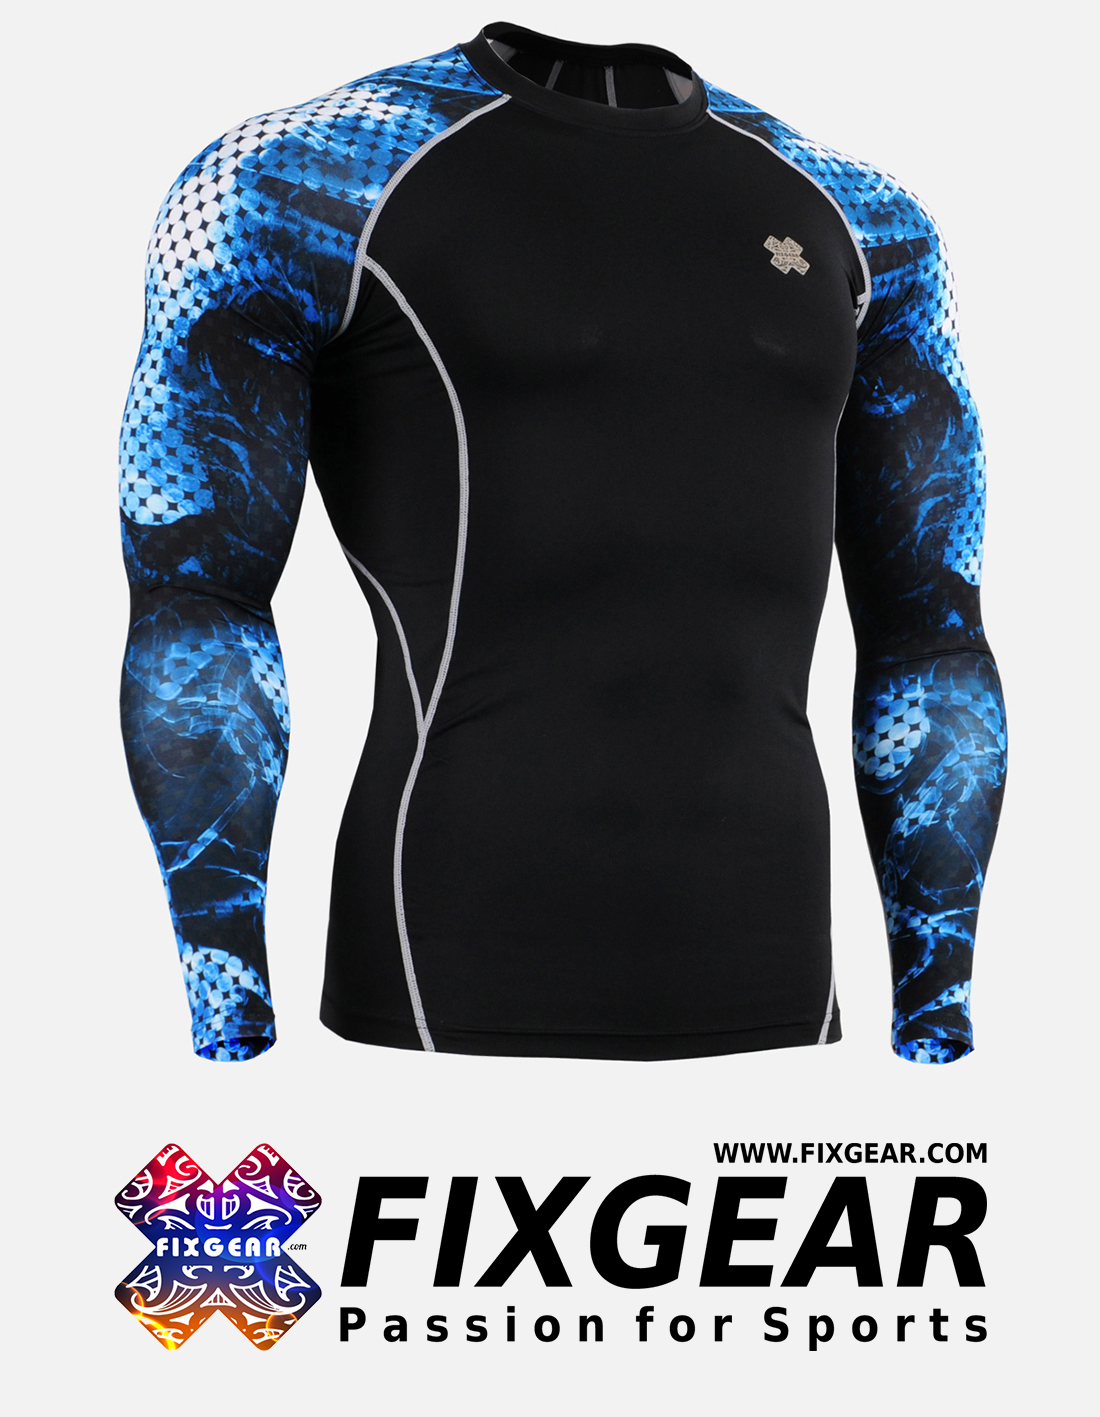 FIXGEAR CPD-B66 Compression Base Layer Shirt